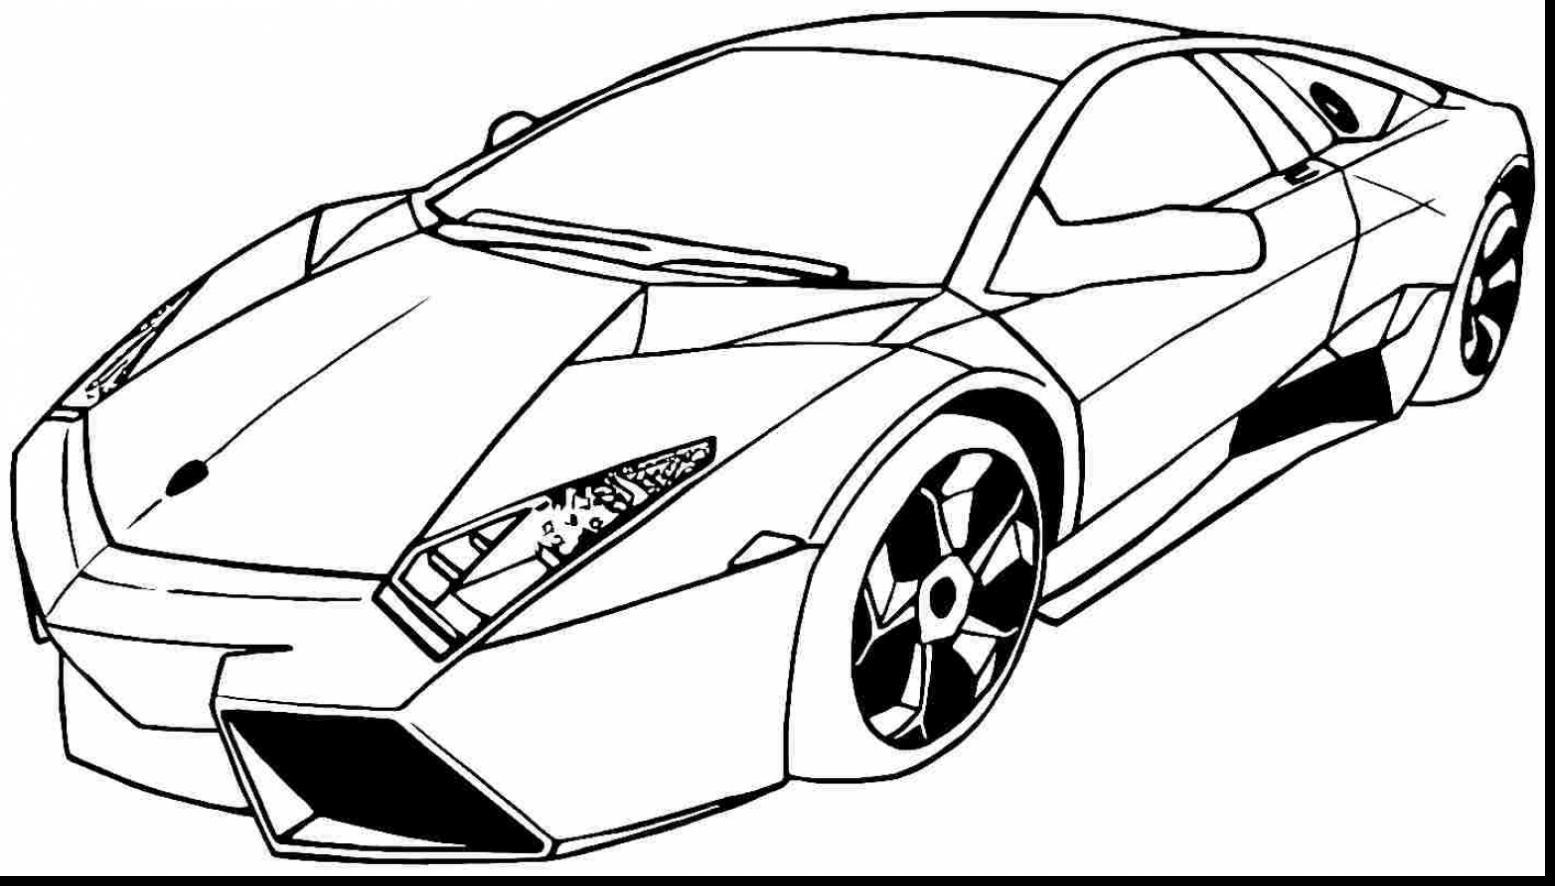 Lamborghini Drawing Pictures At Getdrawings Com Free For Personal